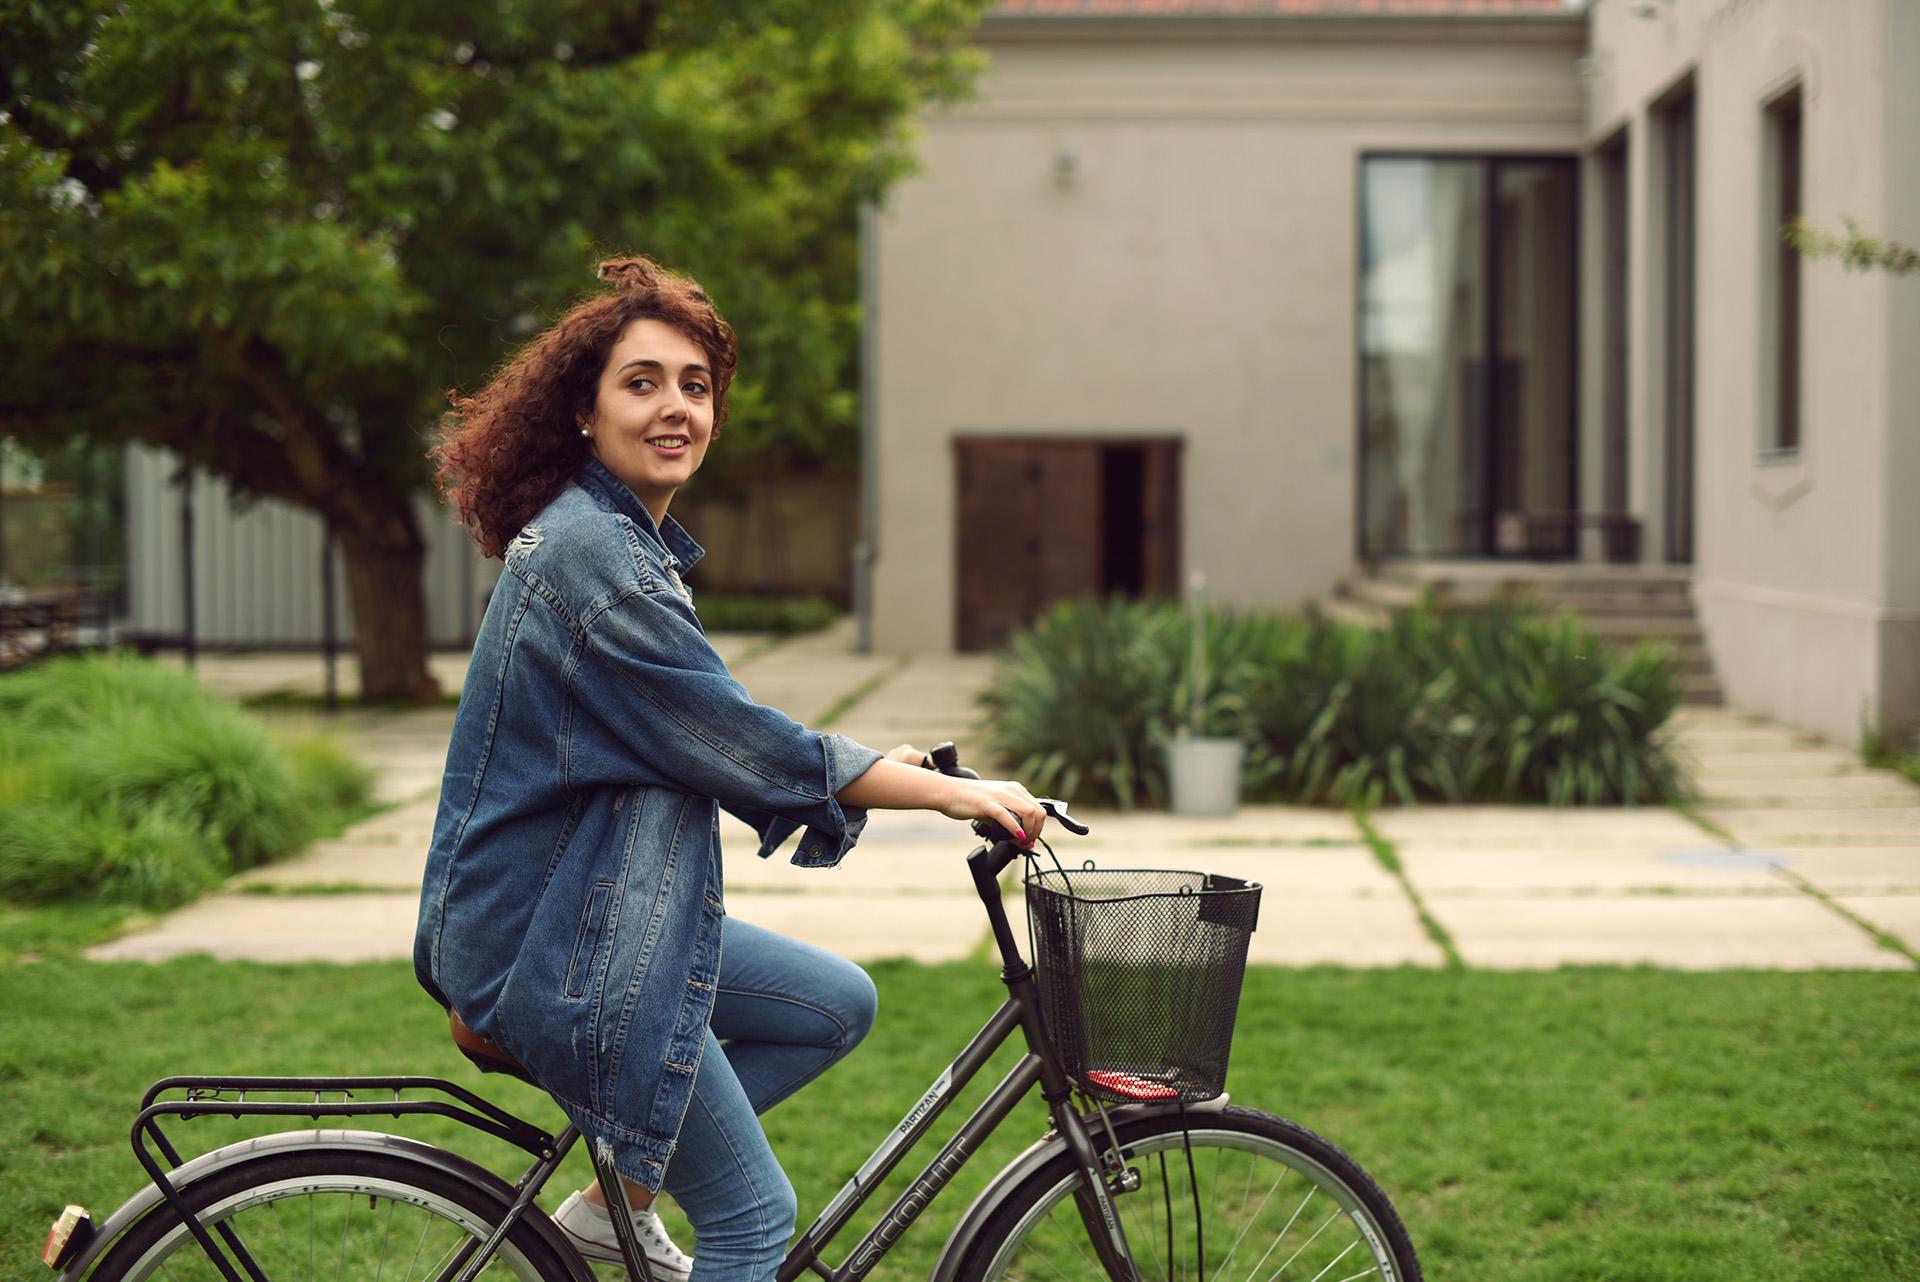 1 Yard Bike